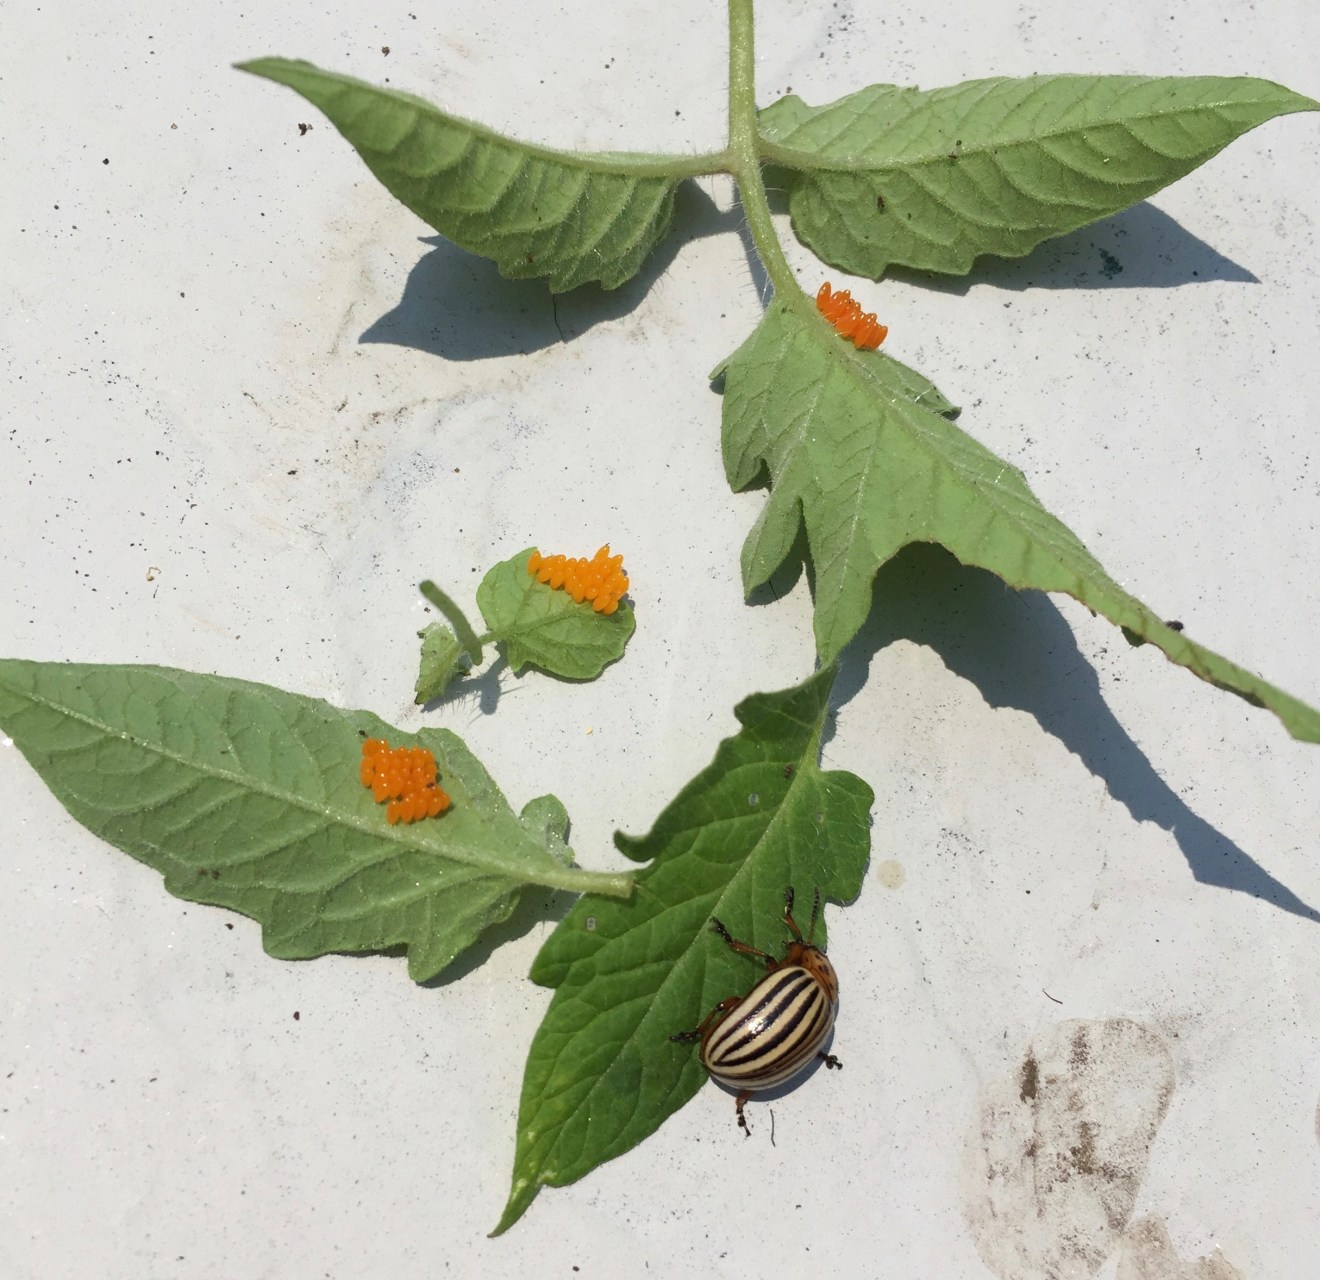 Colorado Potato Beetles and How to Predict Garden Pest Infestations